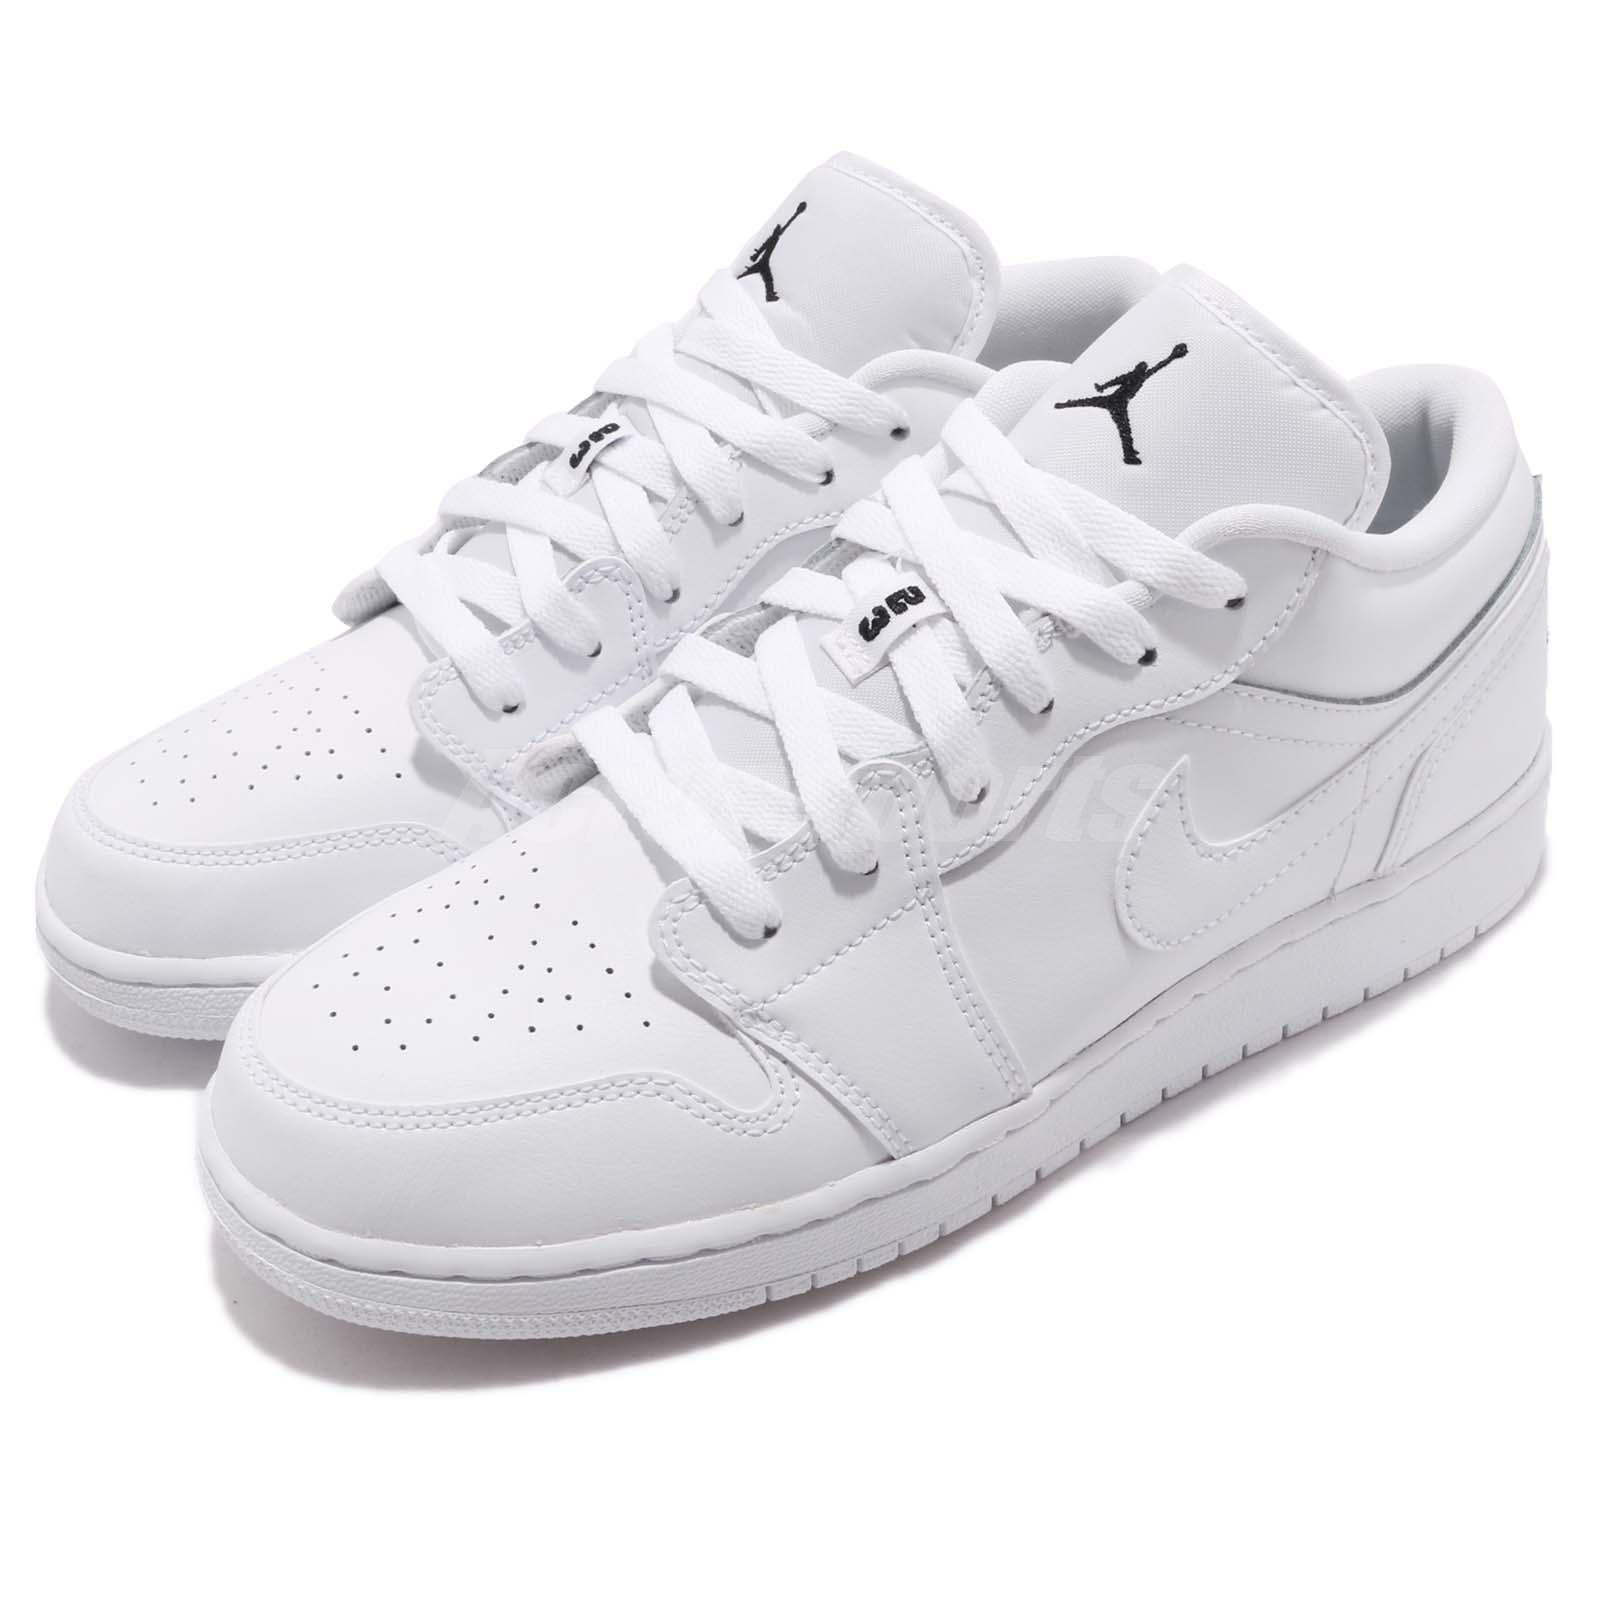 Kid 101 About White Women 1 Details Black 553560 Gs I Aj1 Nike Jordan Low Shoes Air Basketball PkwNnOZX80